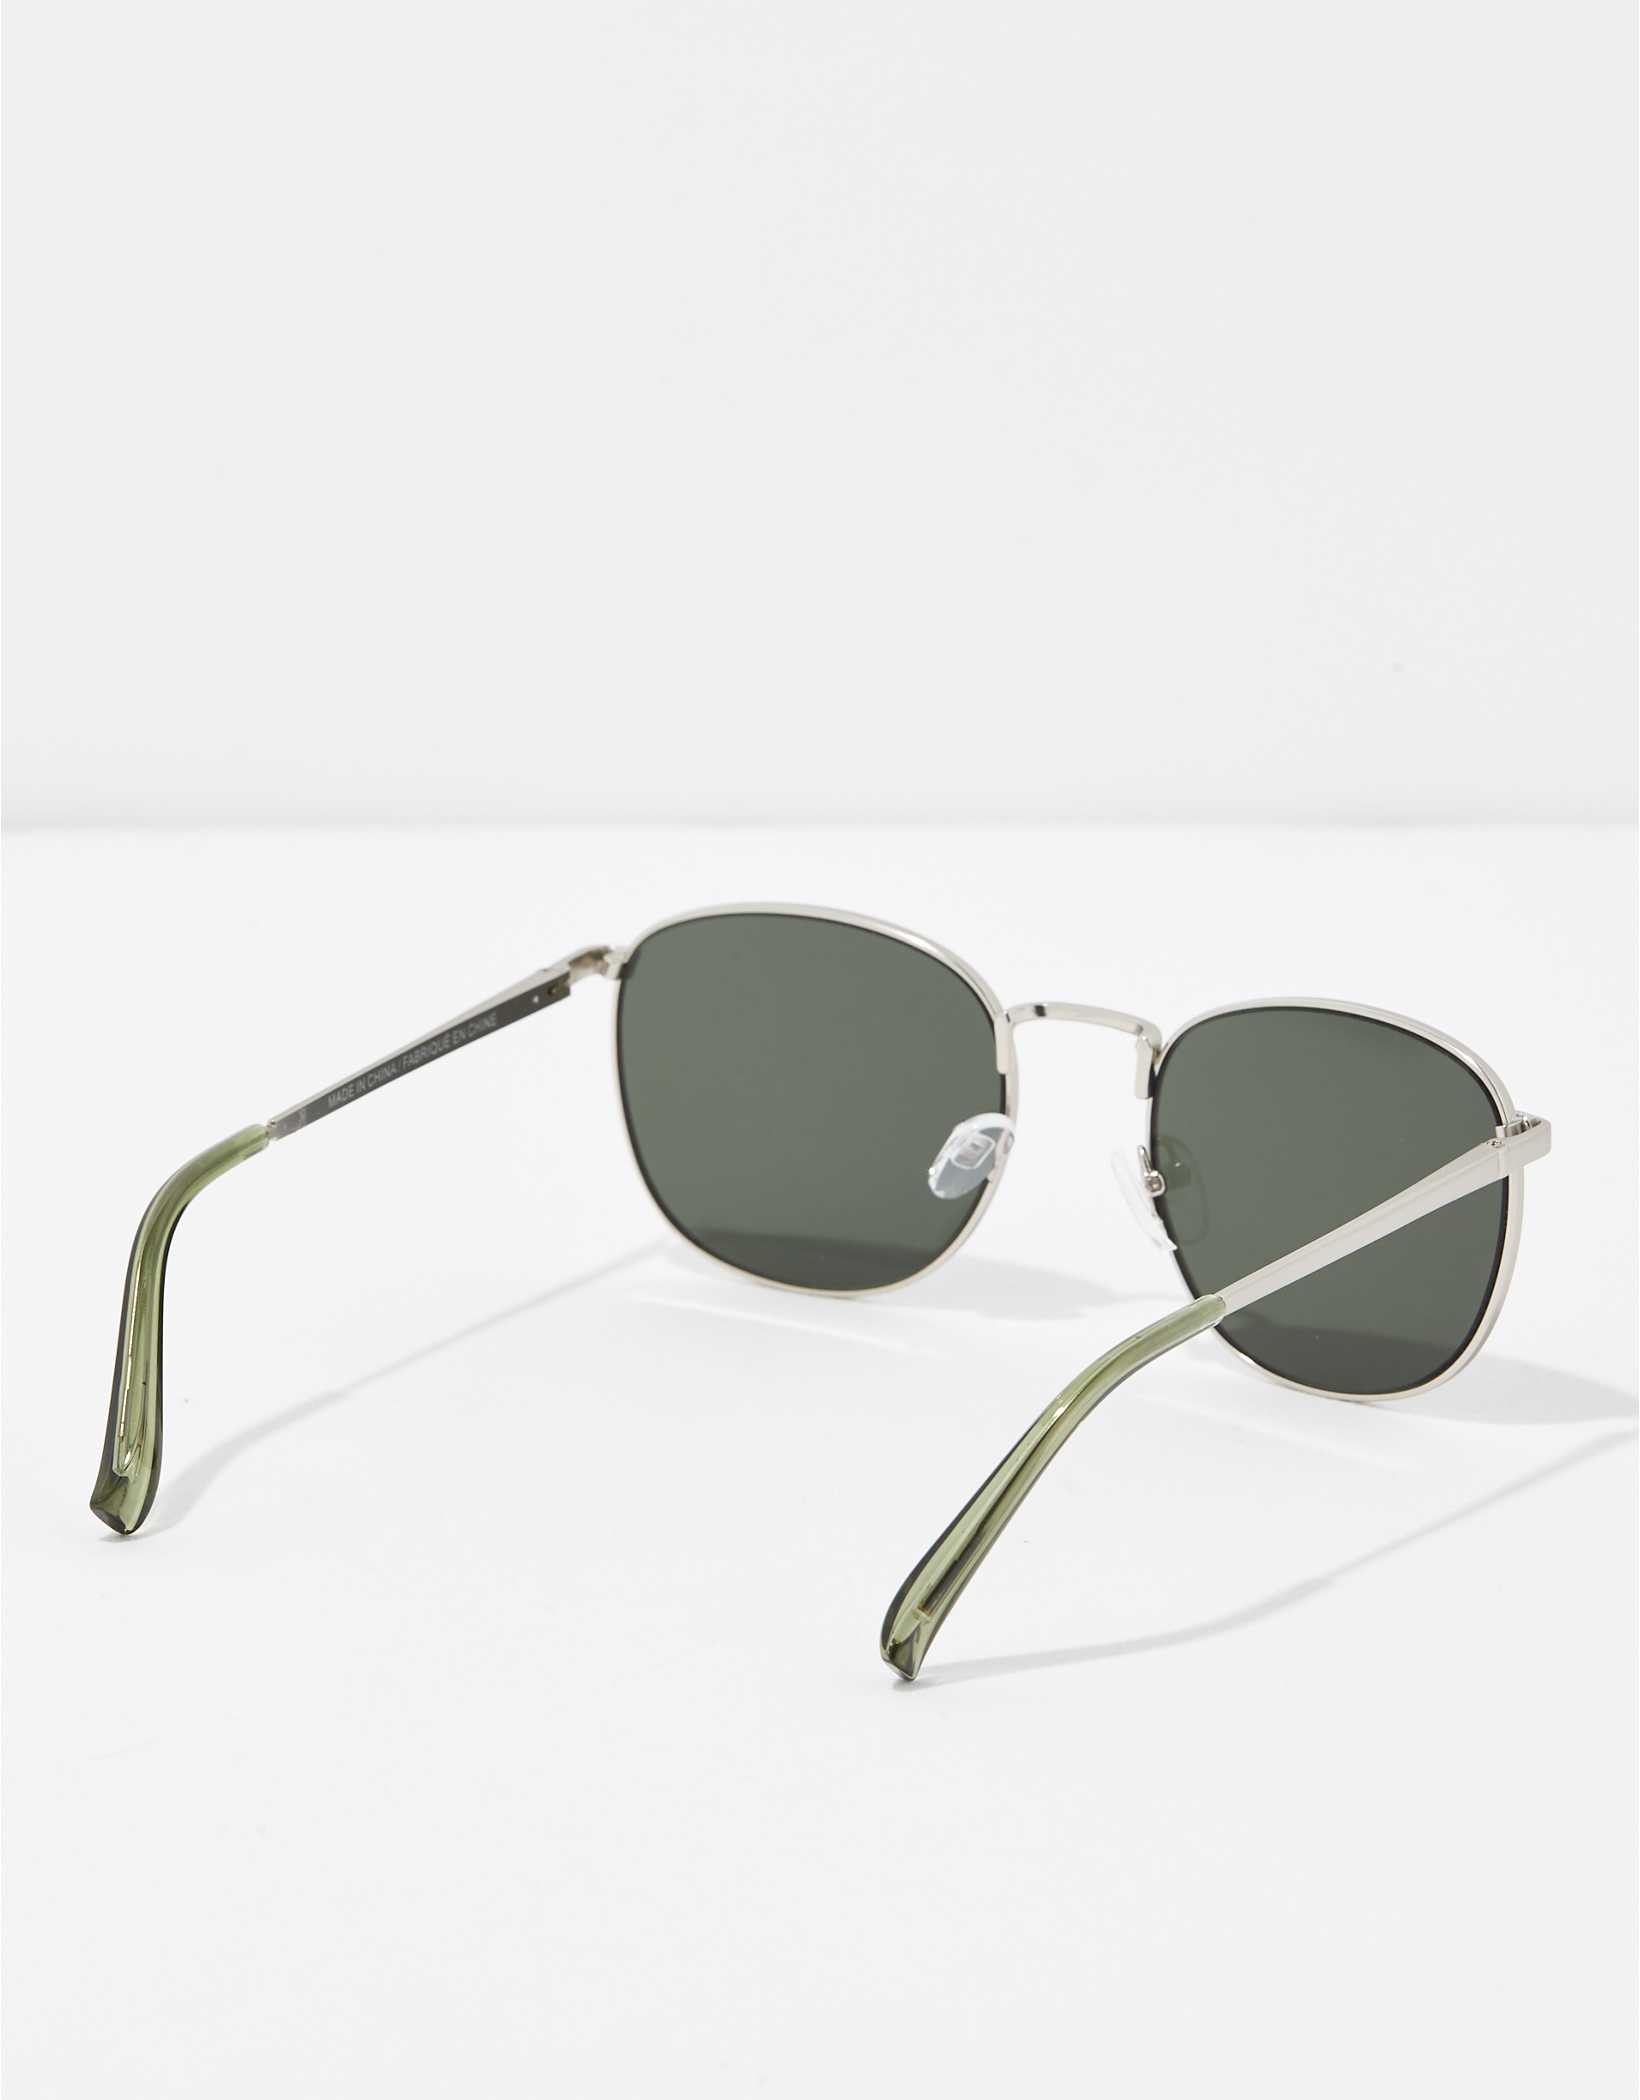 AEO Round Sunglasses